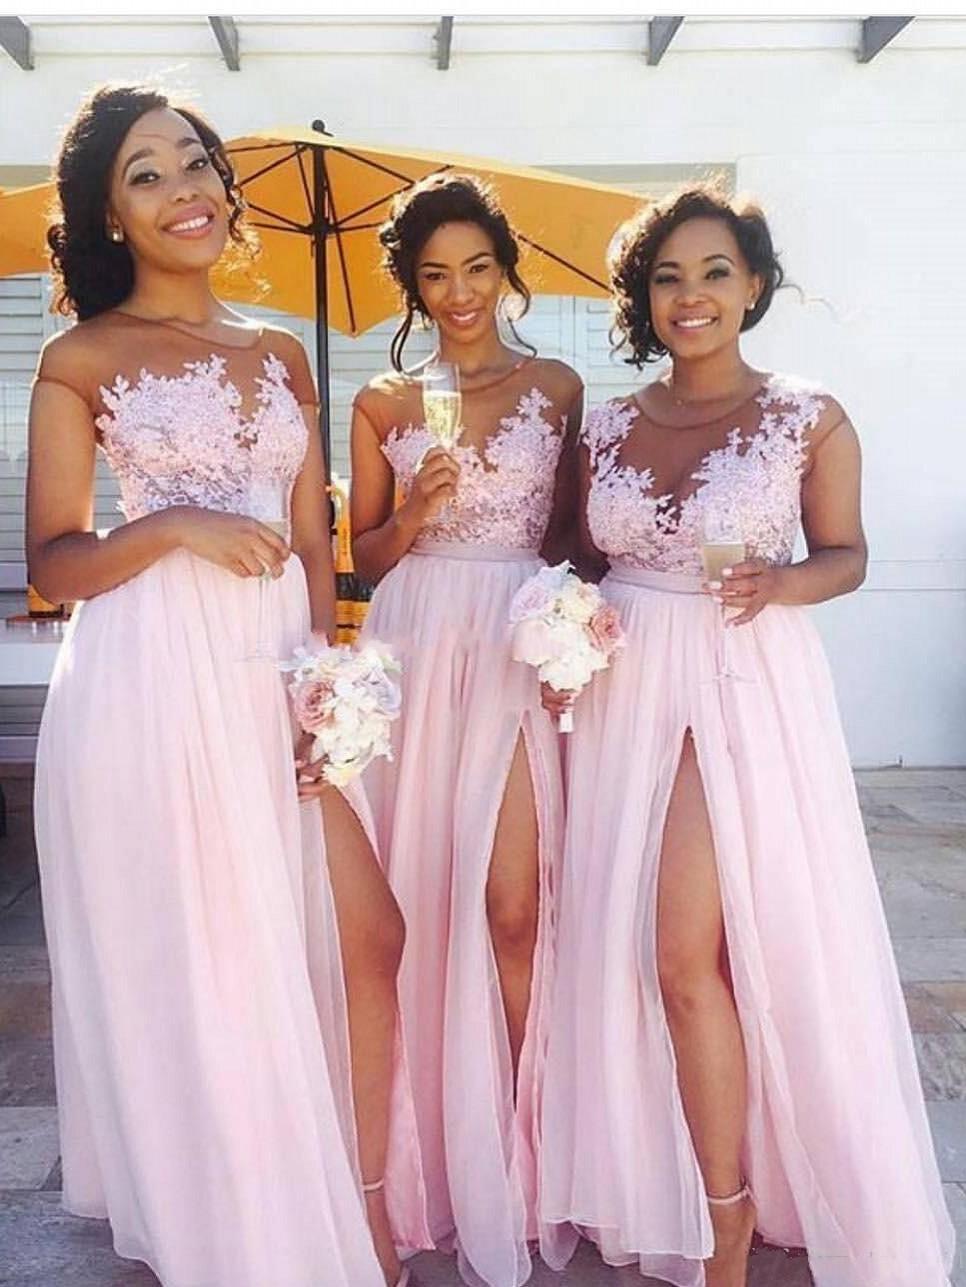 f52a9bc3e0c2 2019 Cheap Chiffon Blush Pink Bridesmaid Dresses Appliqued Illusion Bodice  Sexy Split Summer Black Women Maid Of Honor BM0146 Black And Red Bridesmaid  ...